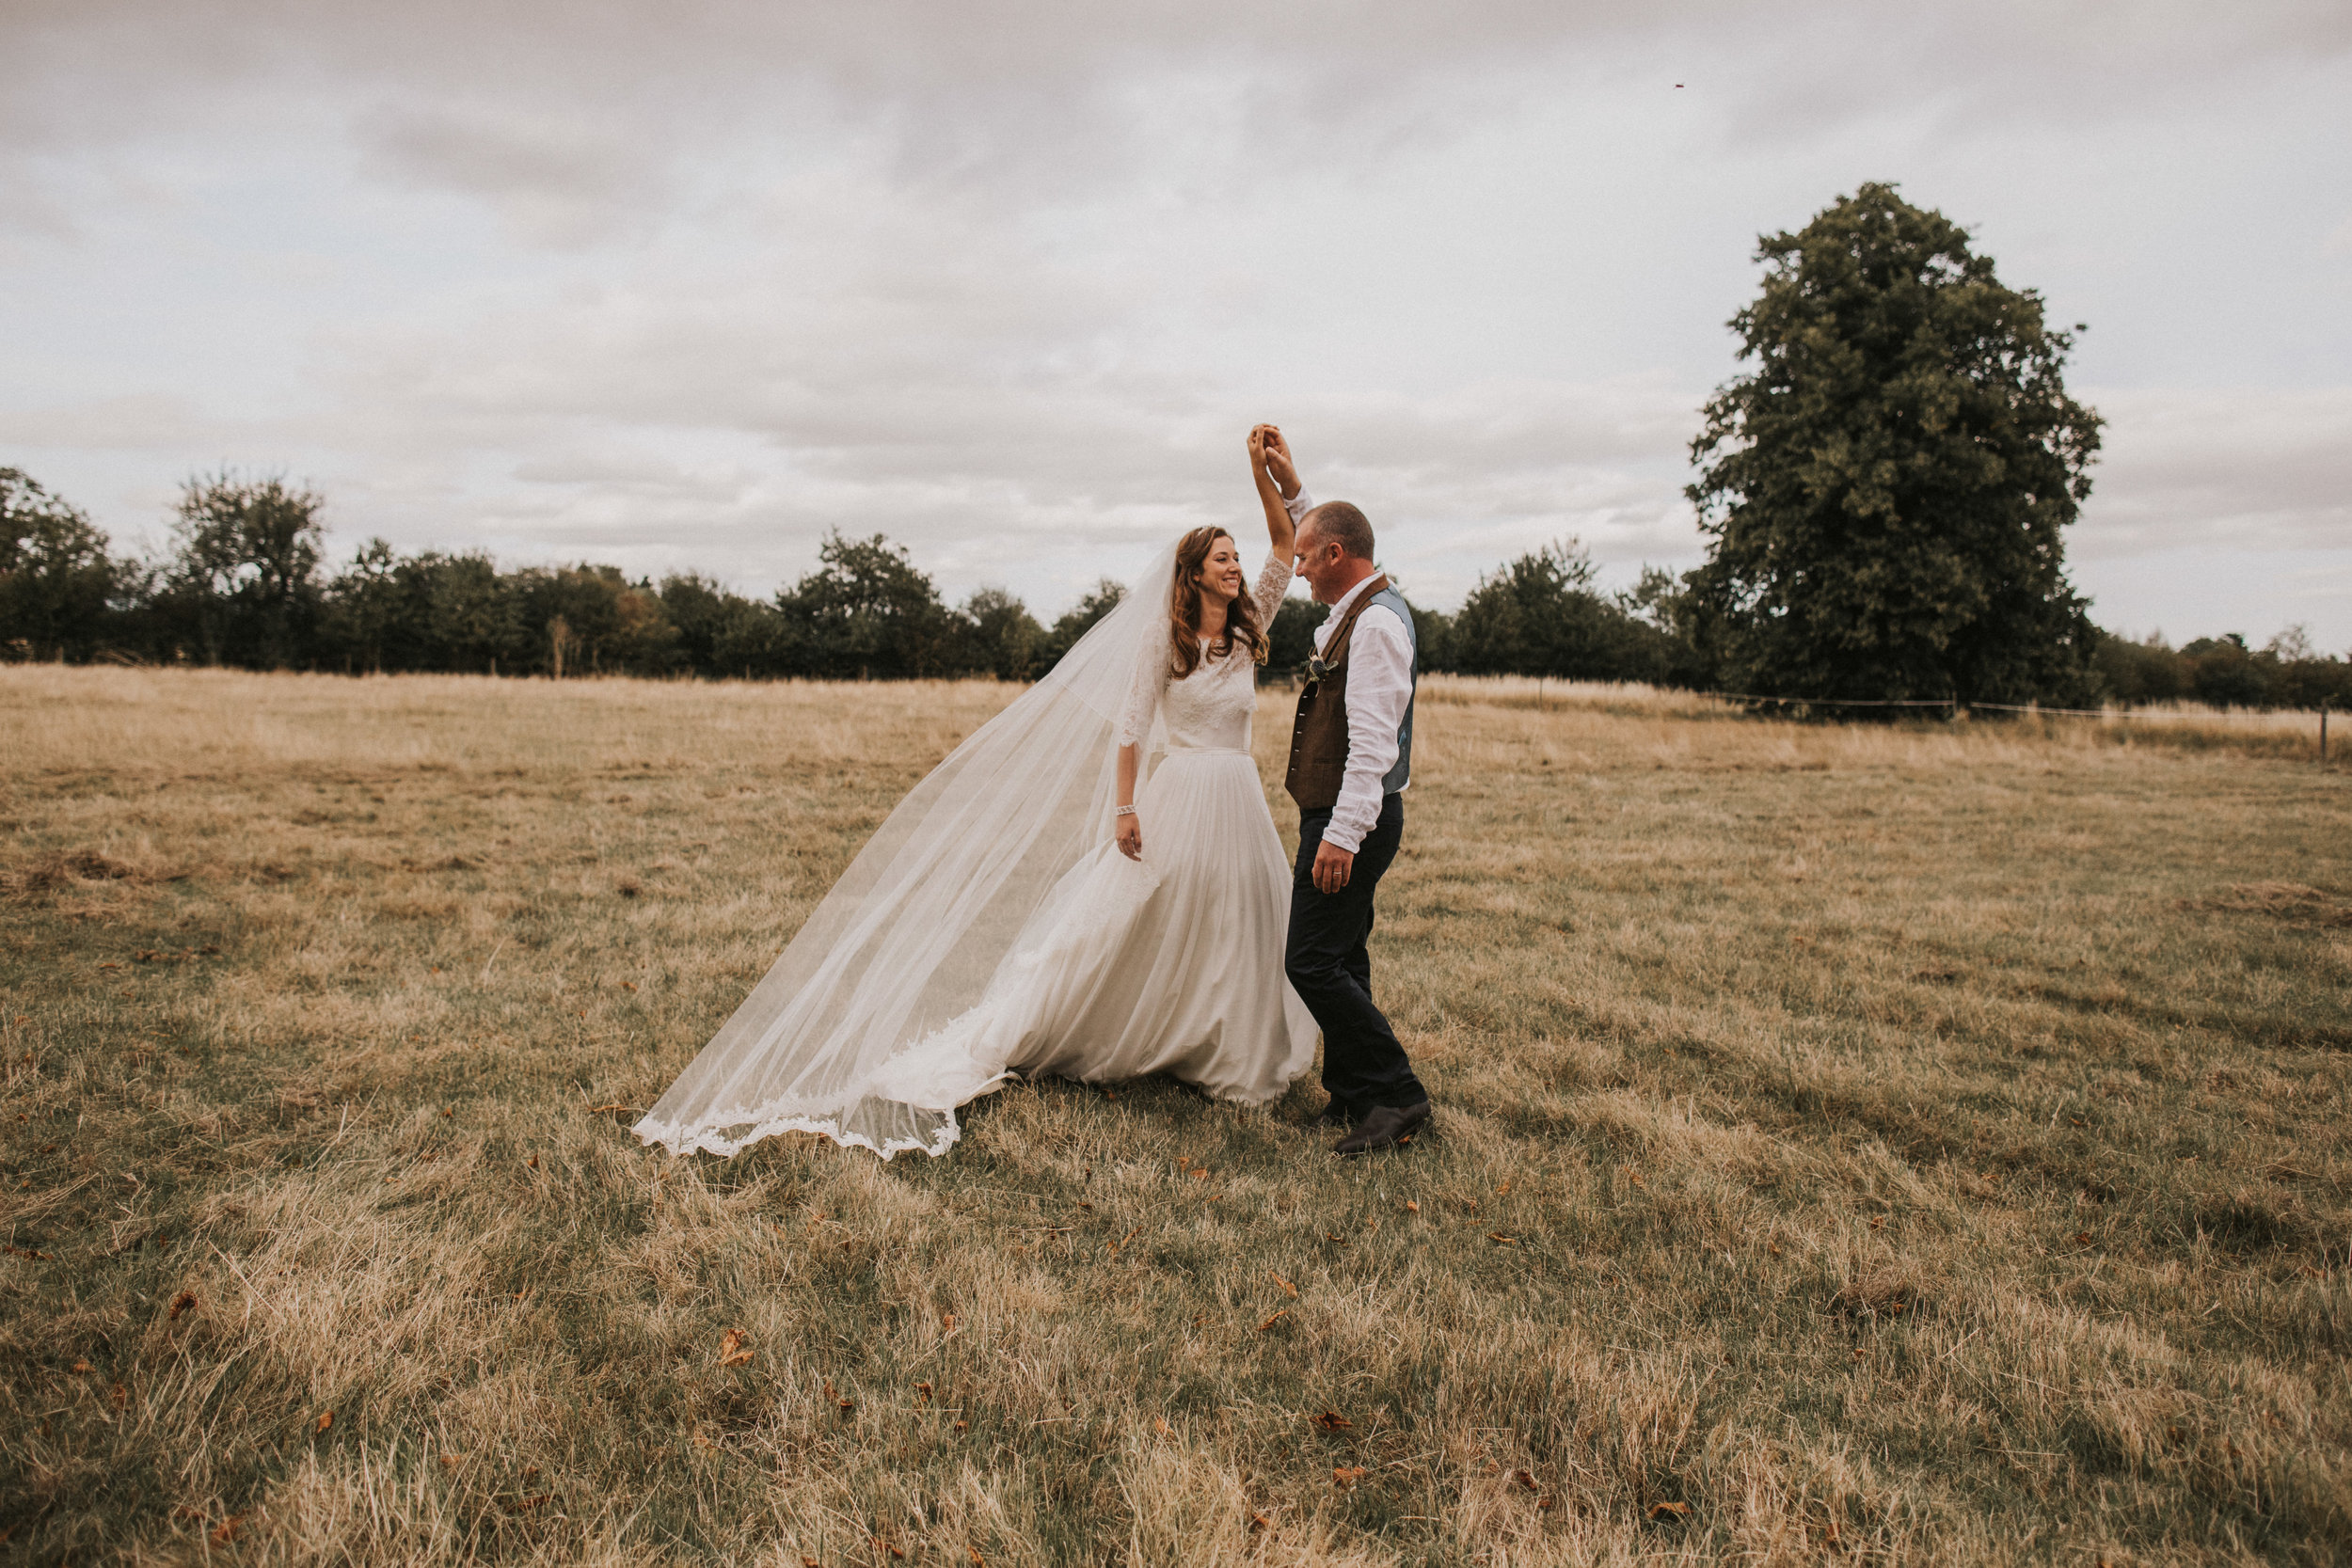 brook rose photography  Farm wedding_203.jpg